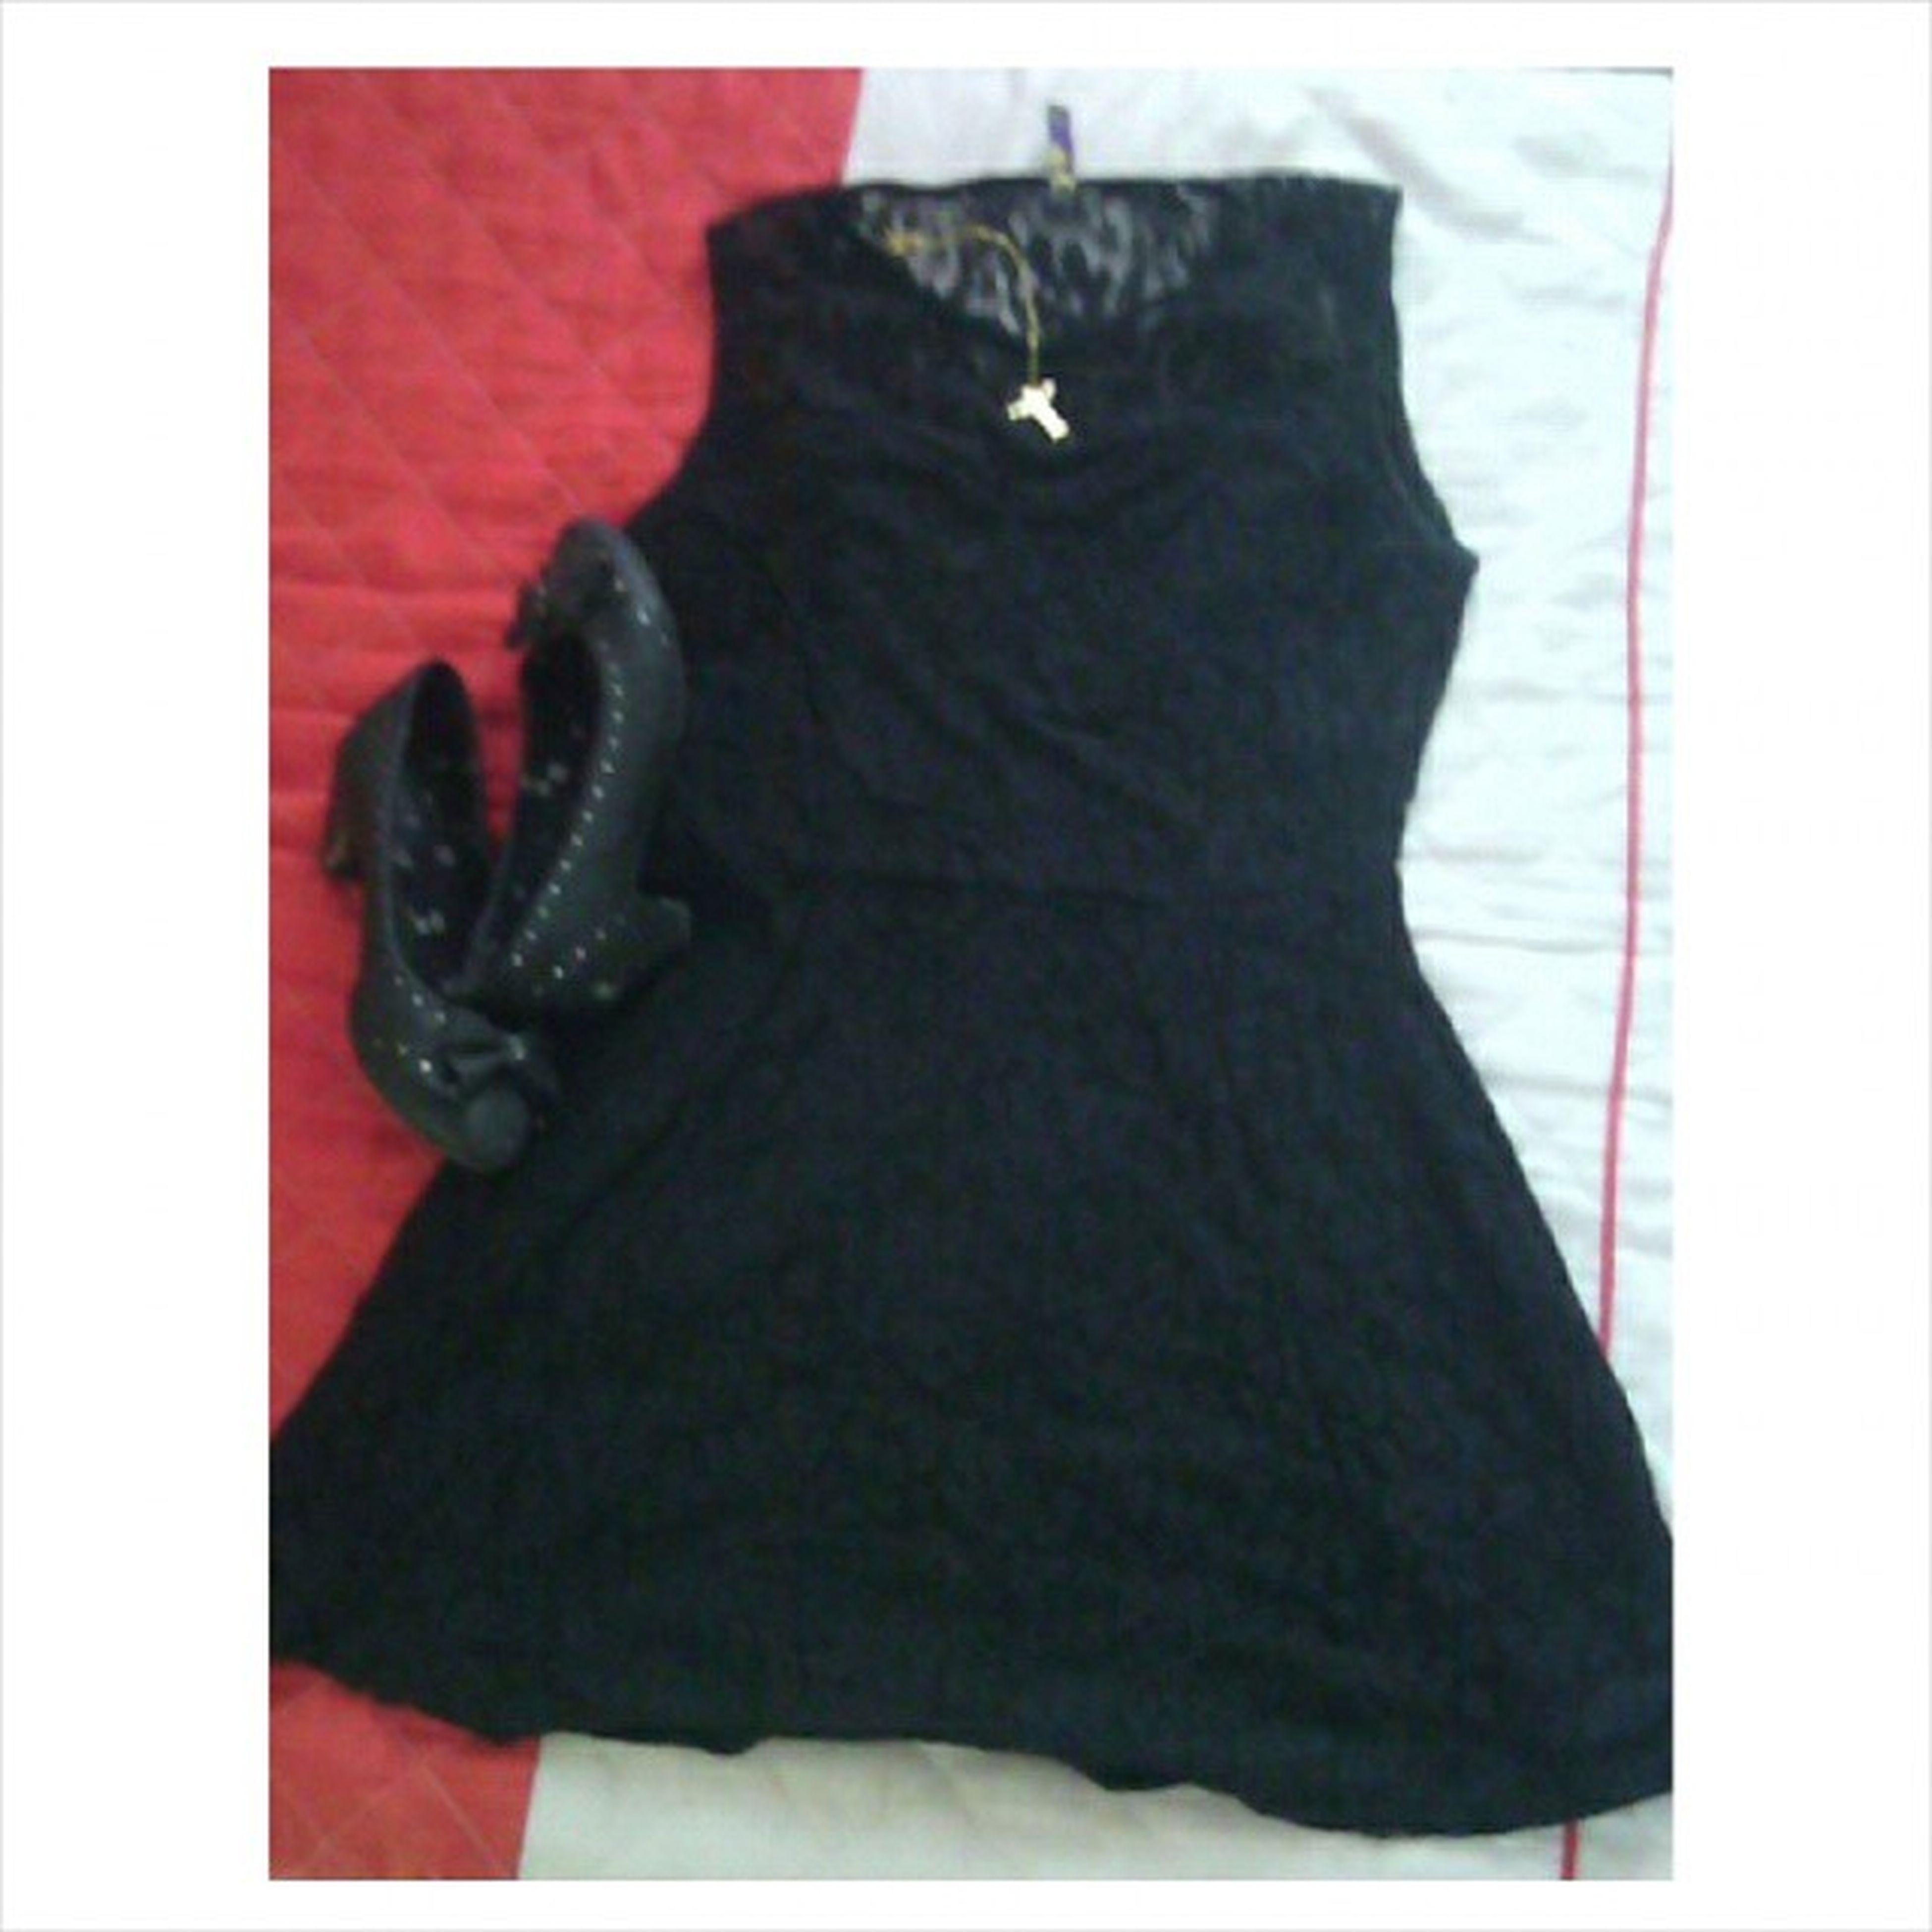 Totalmente cute 👠👗💞💕 Dress Love Maravilhoso LookNight Perfeitinho